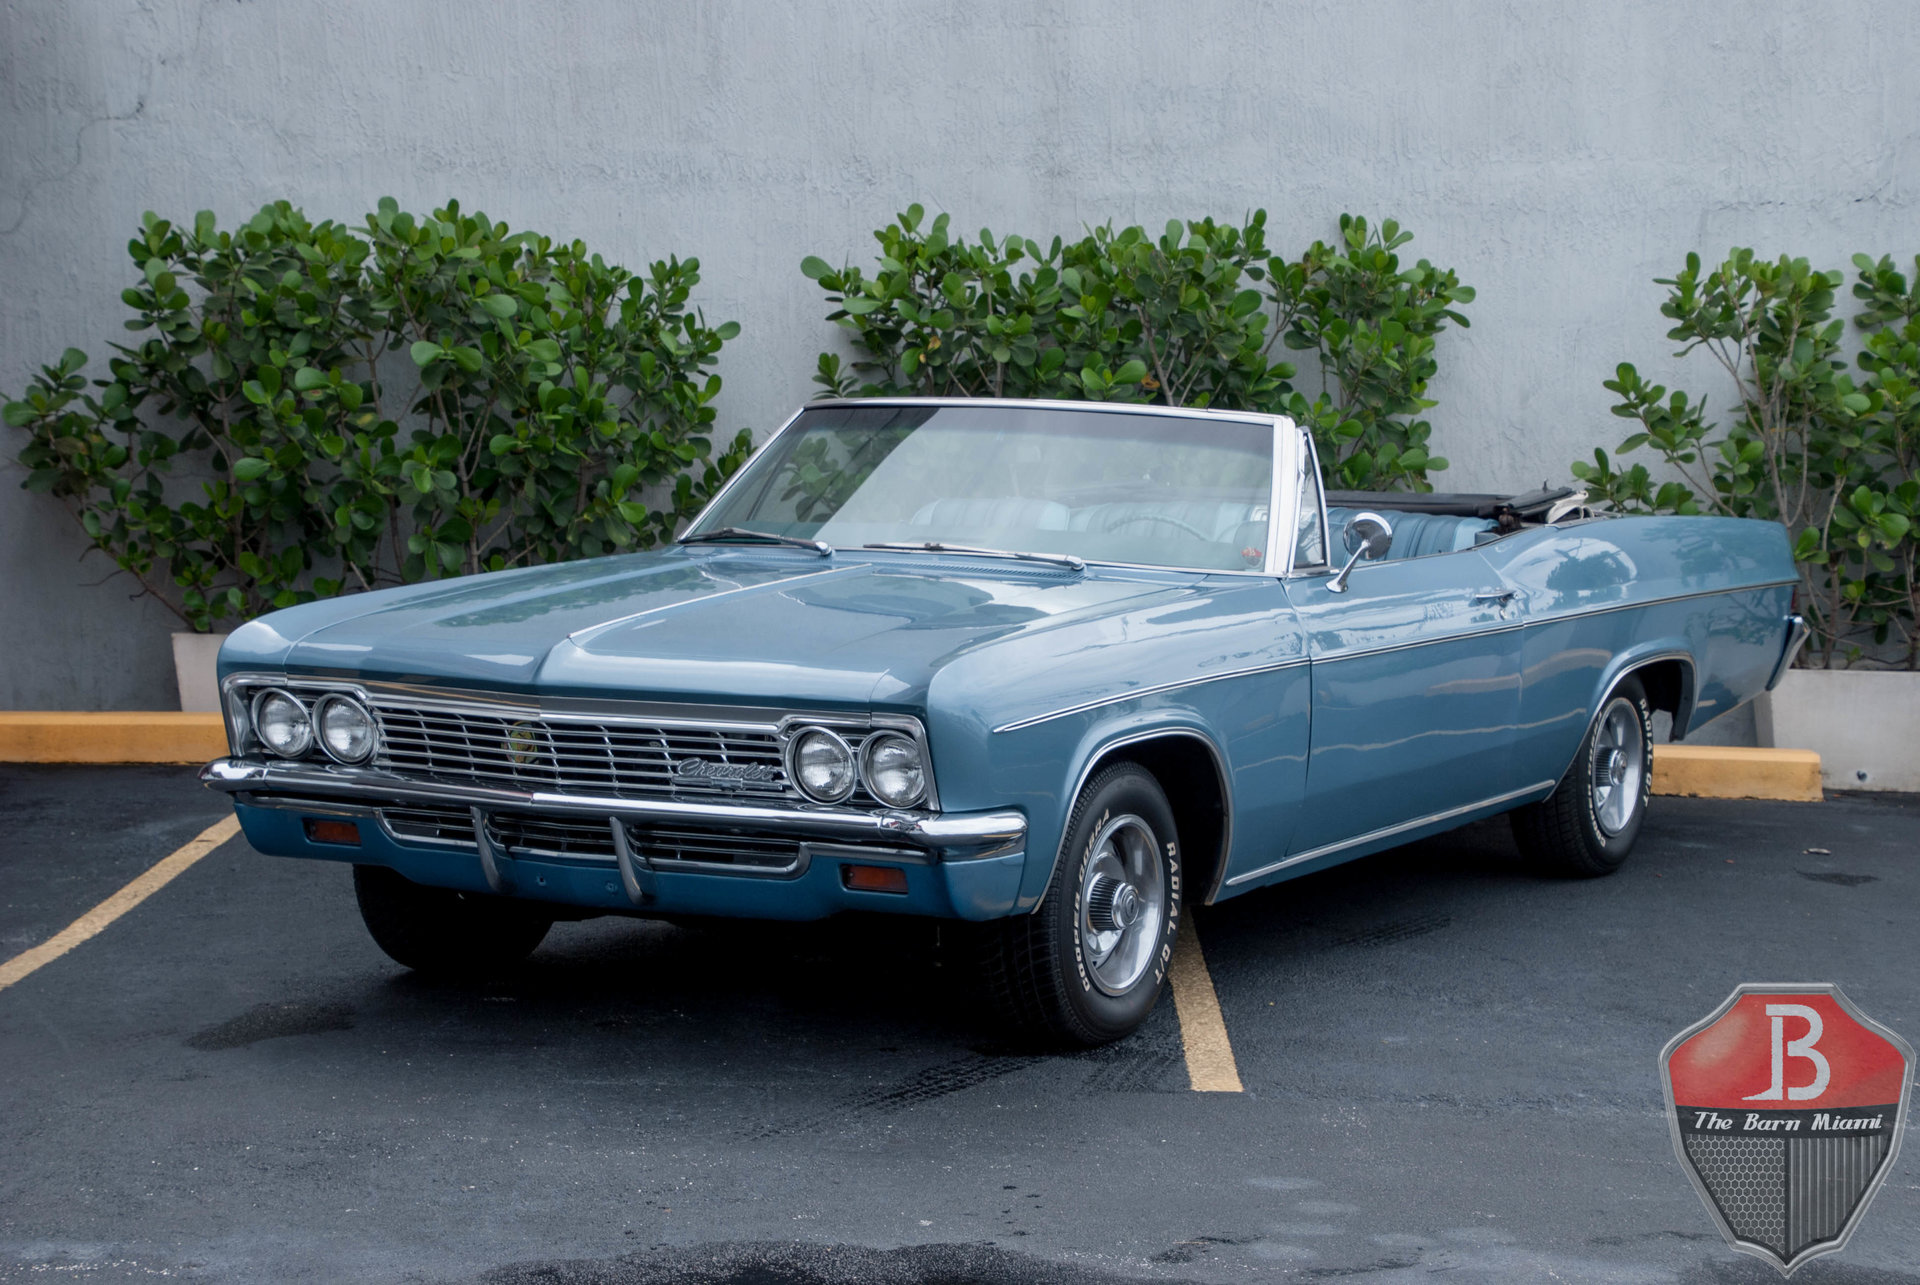 1852581c24d32 hd 1966 chevrolet impala